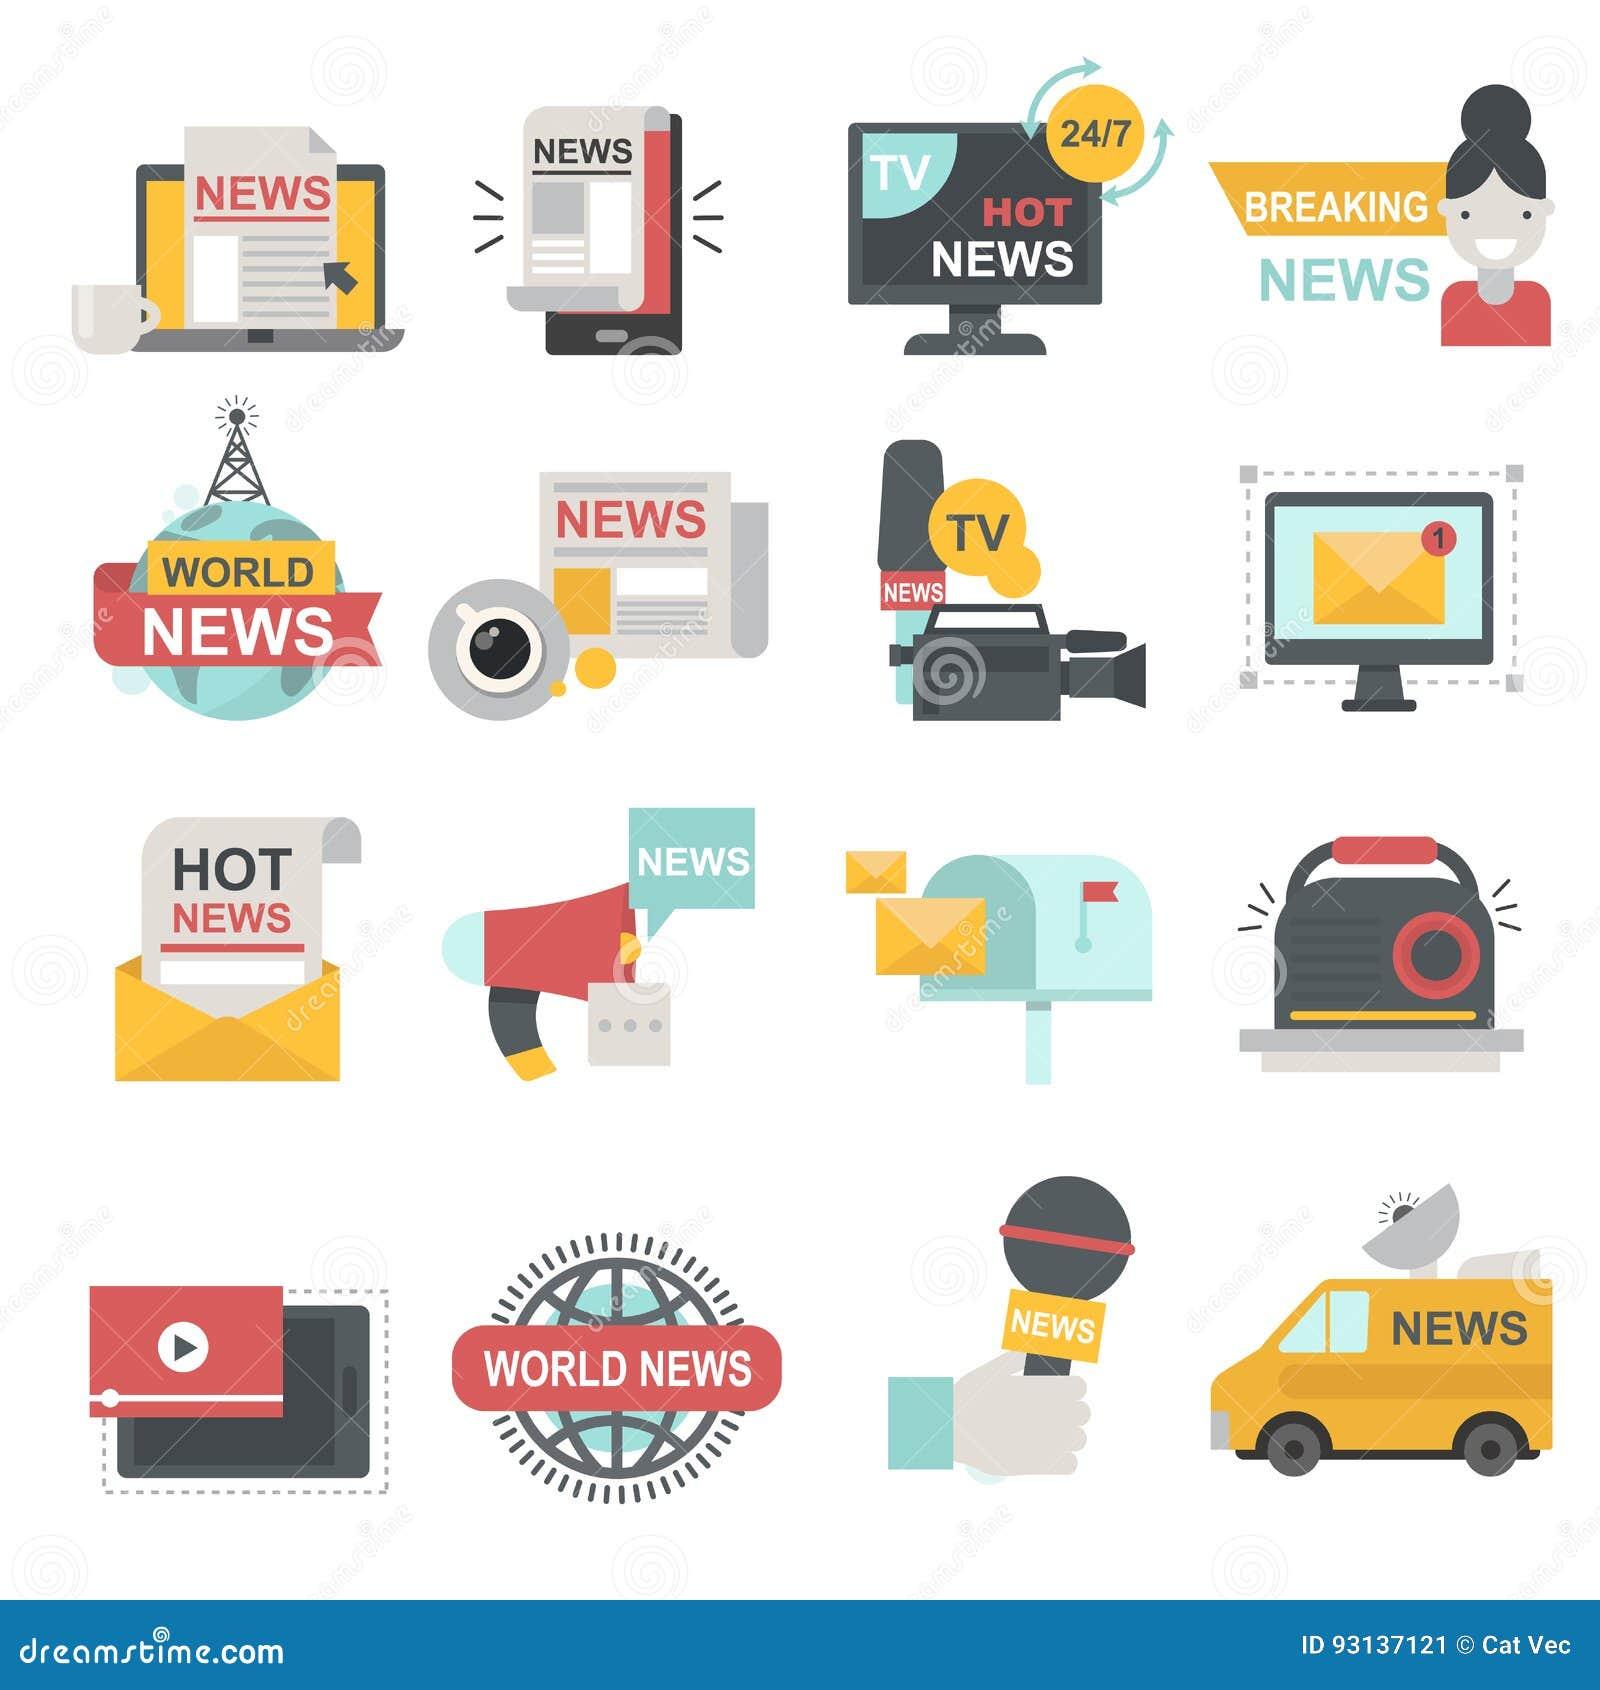 Mass media icons set with telecommunications radio beaking news broadcast TV or website symbols flat isolated vector